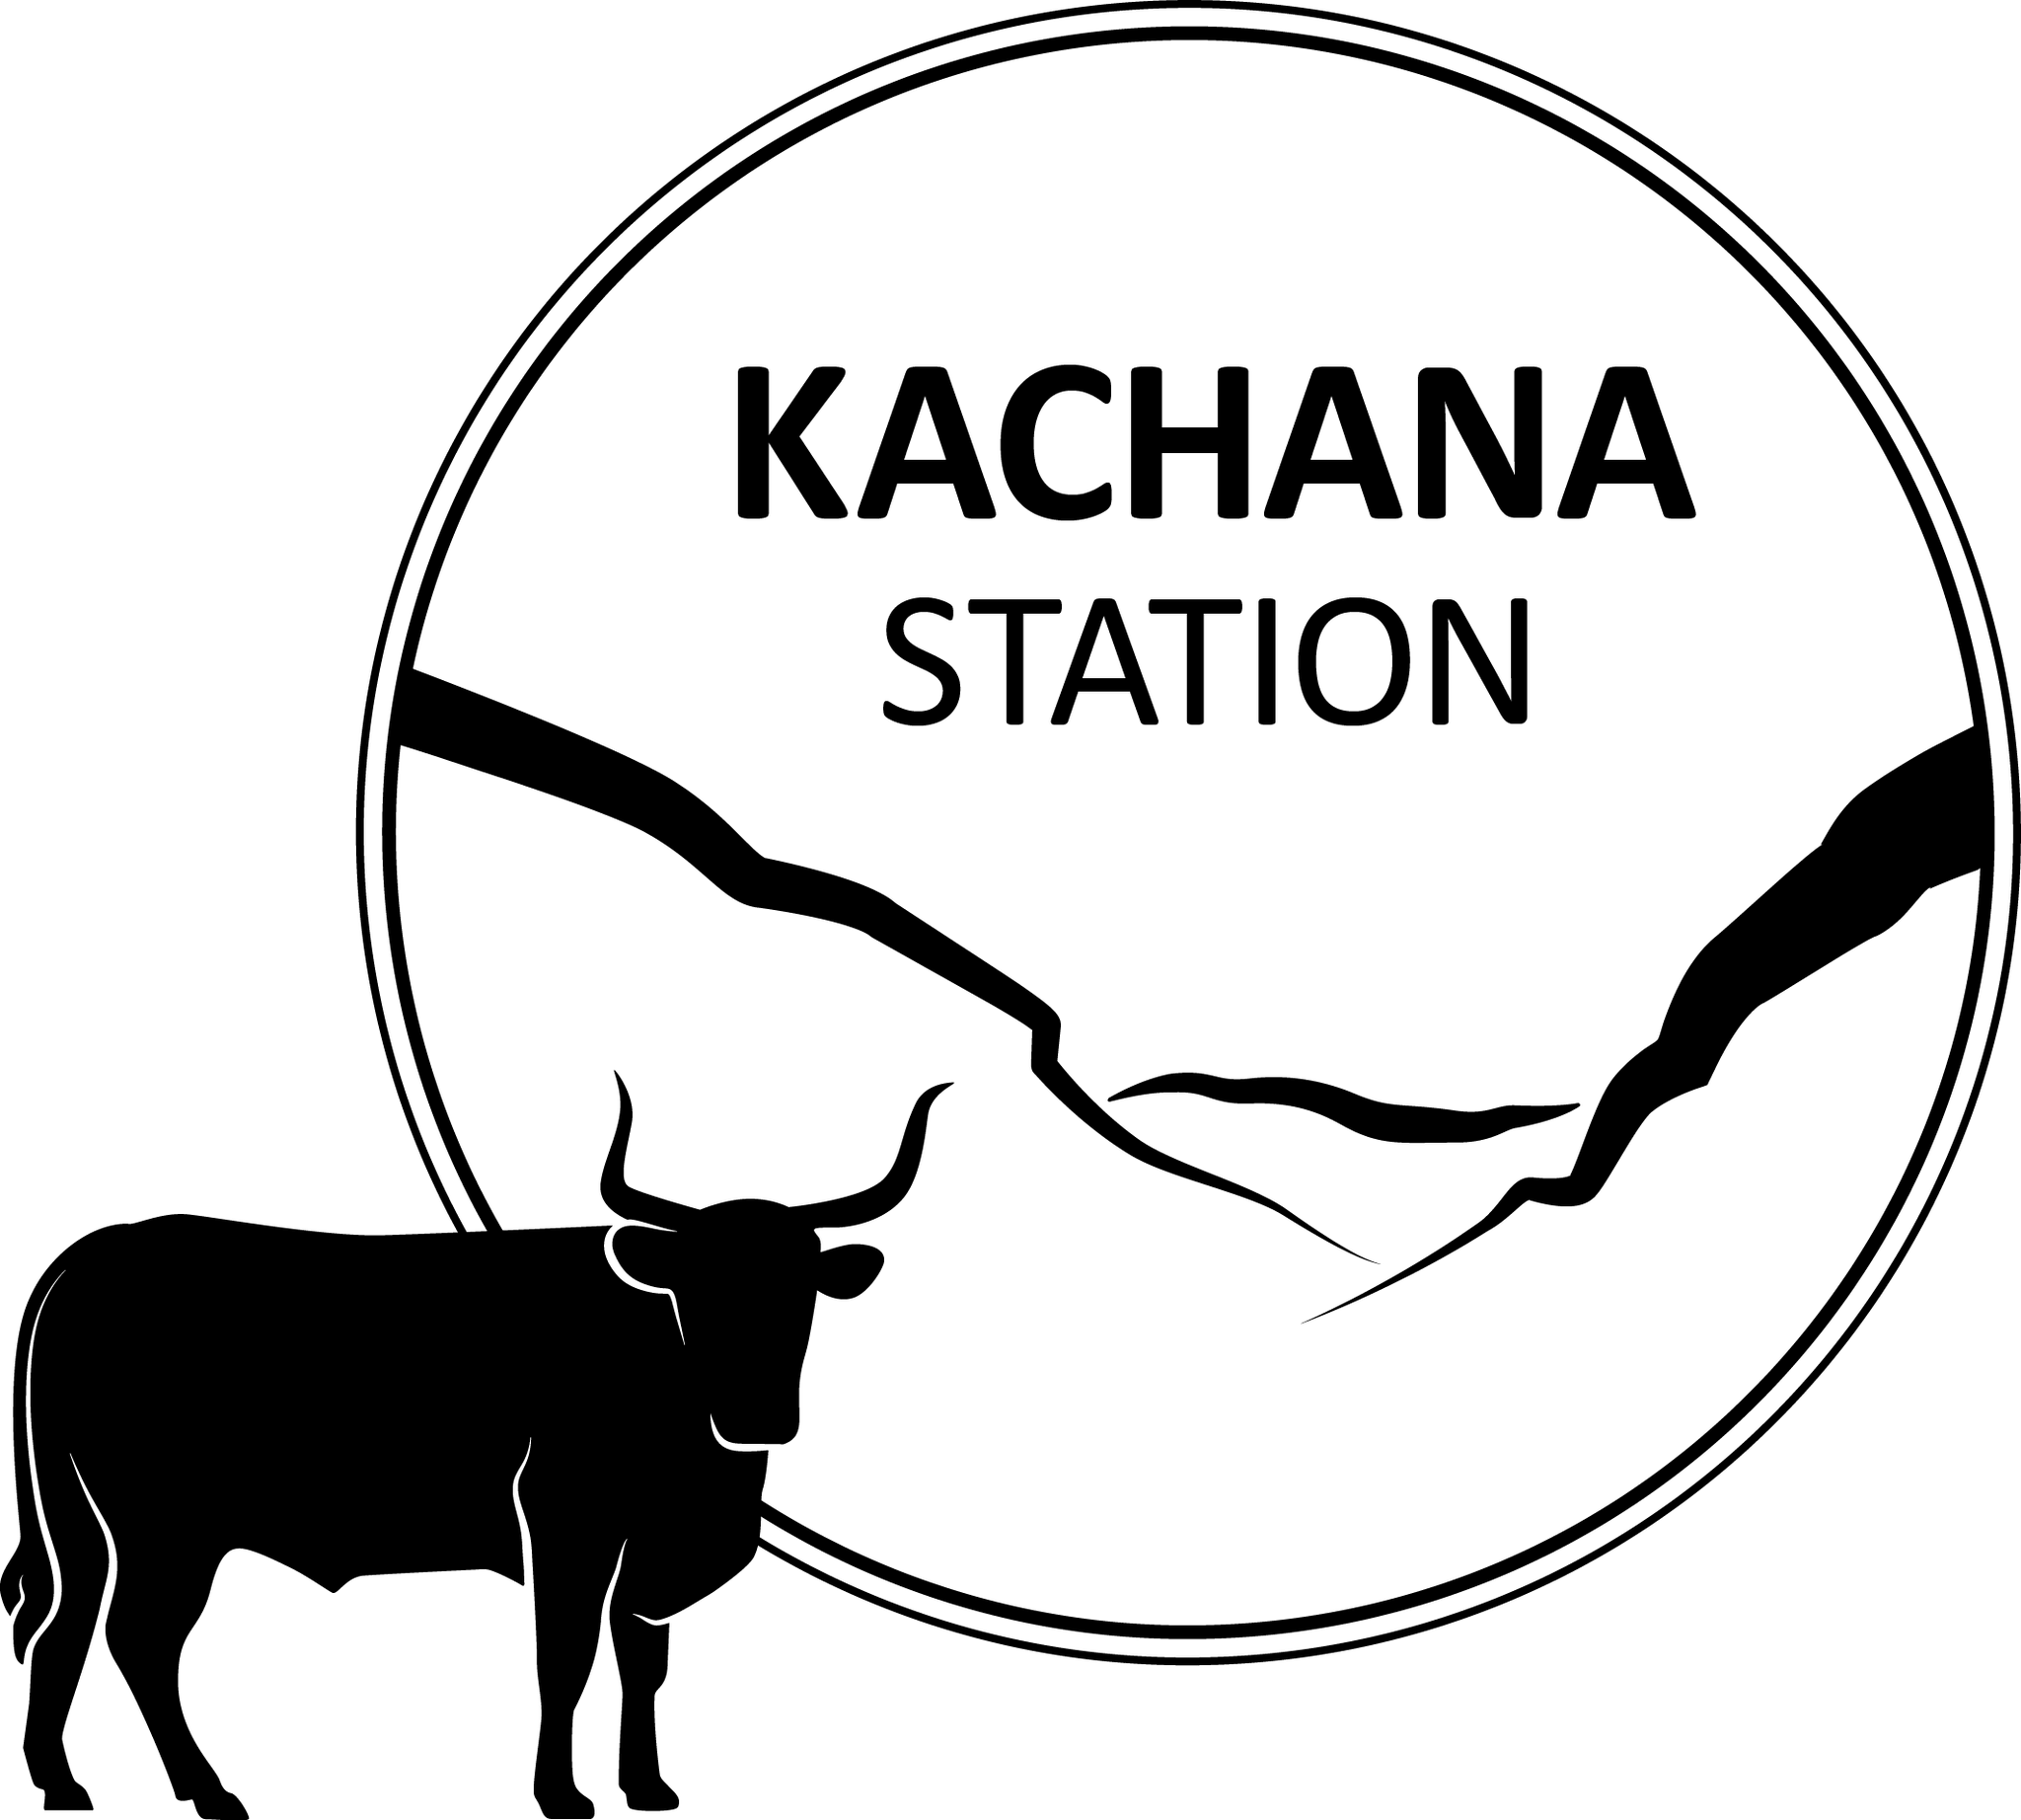 We have a new Kachana Logo!